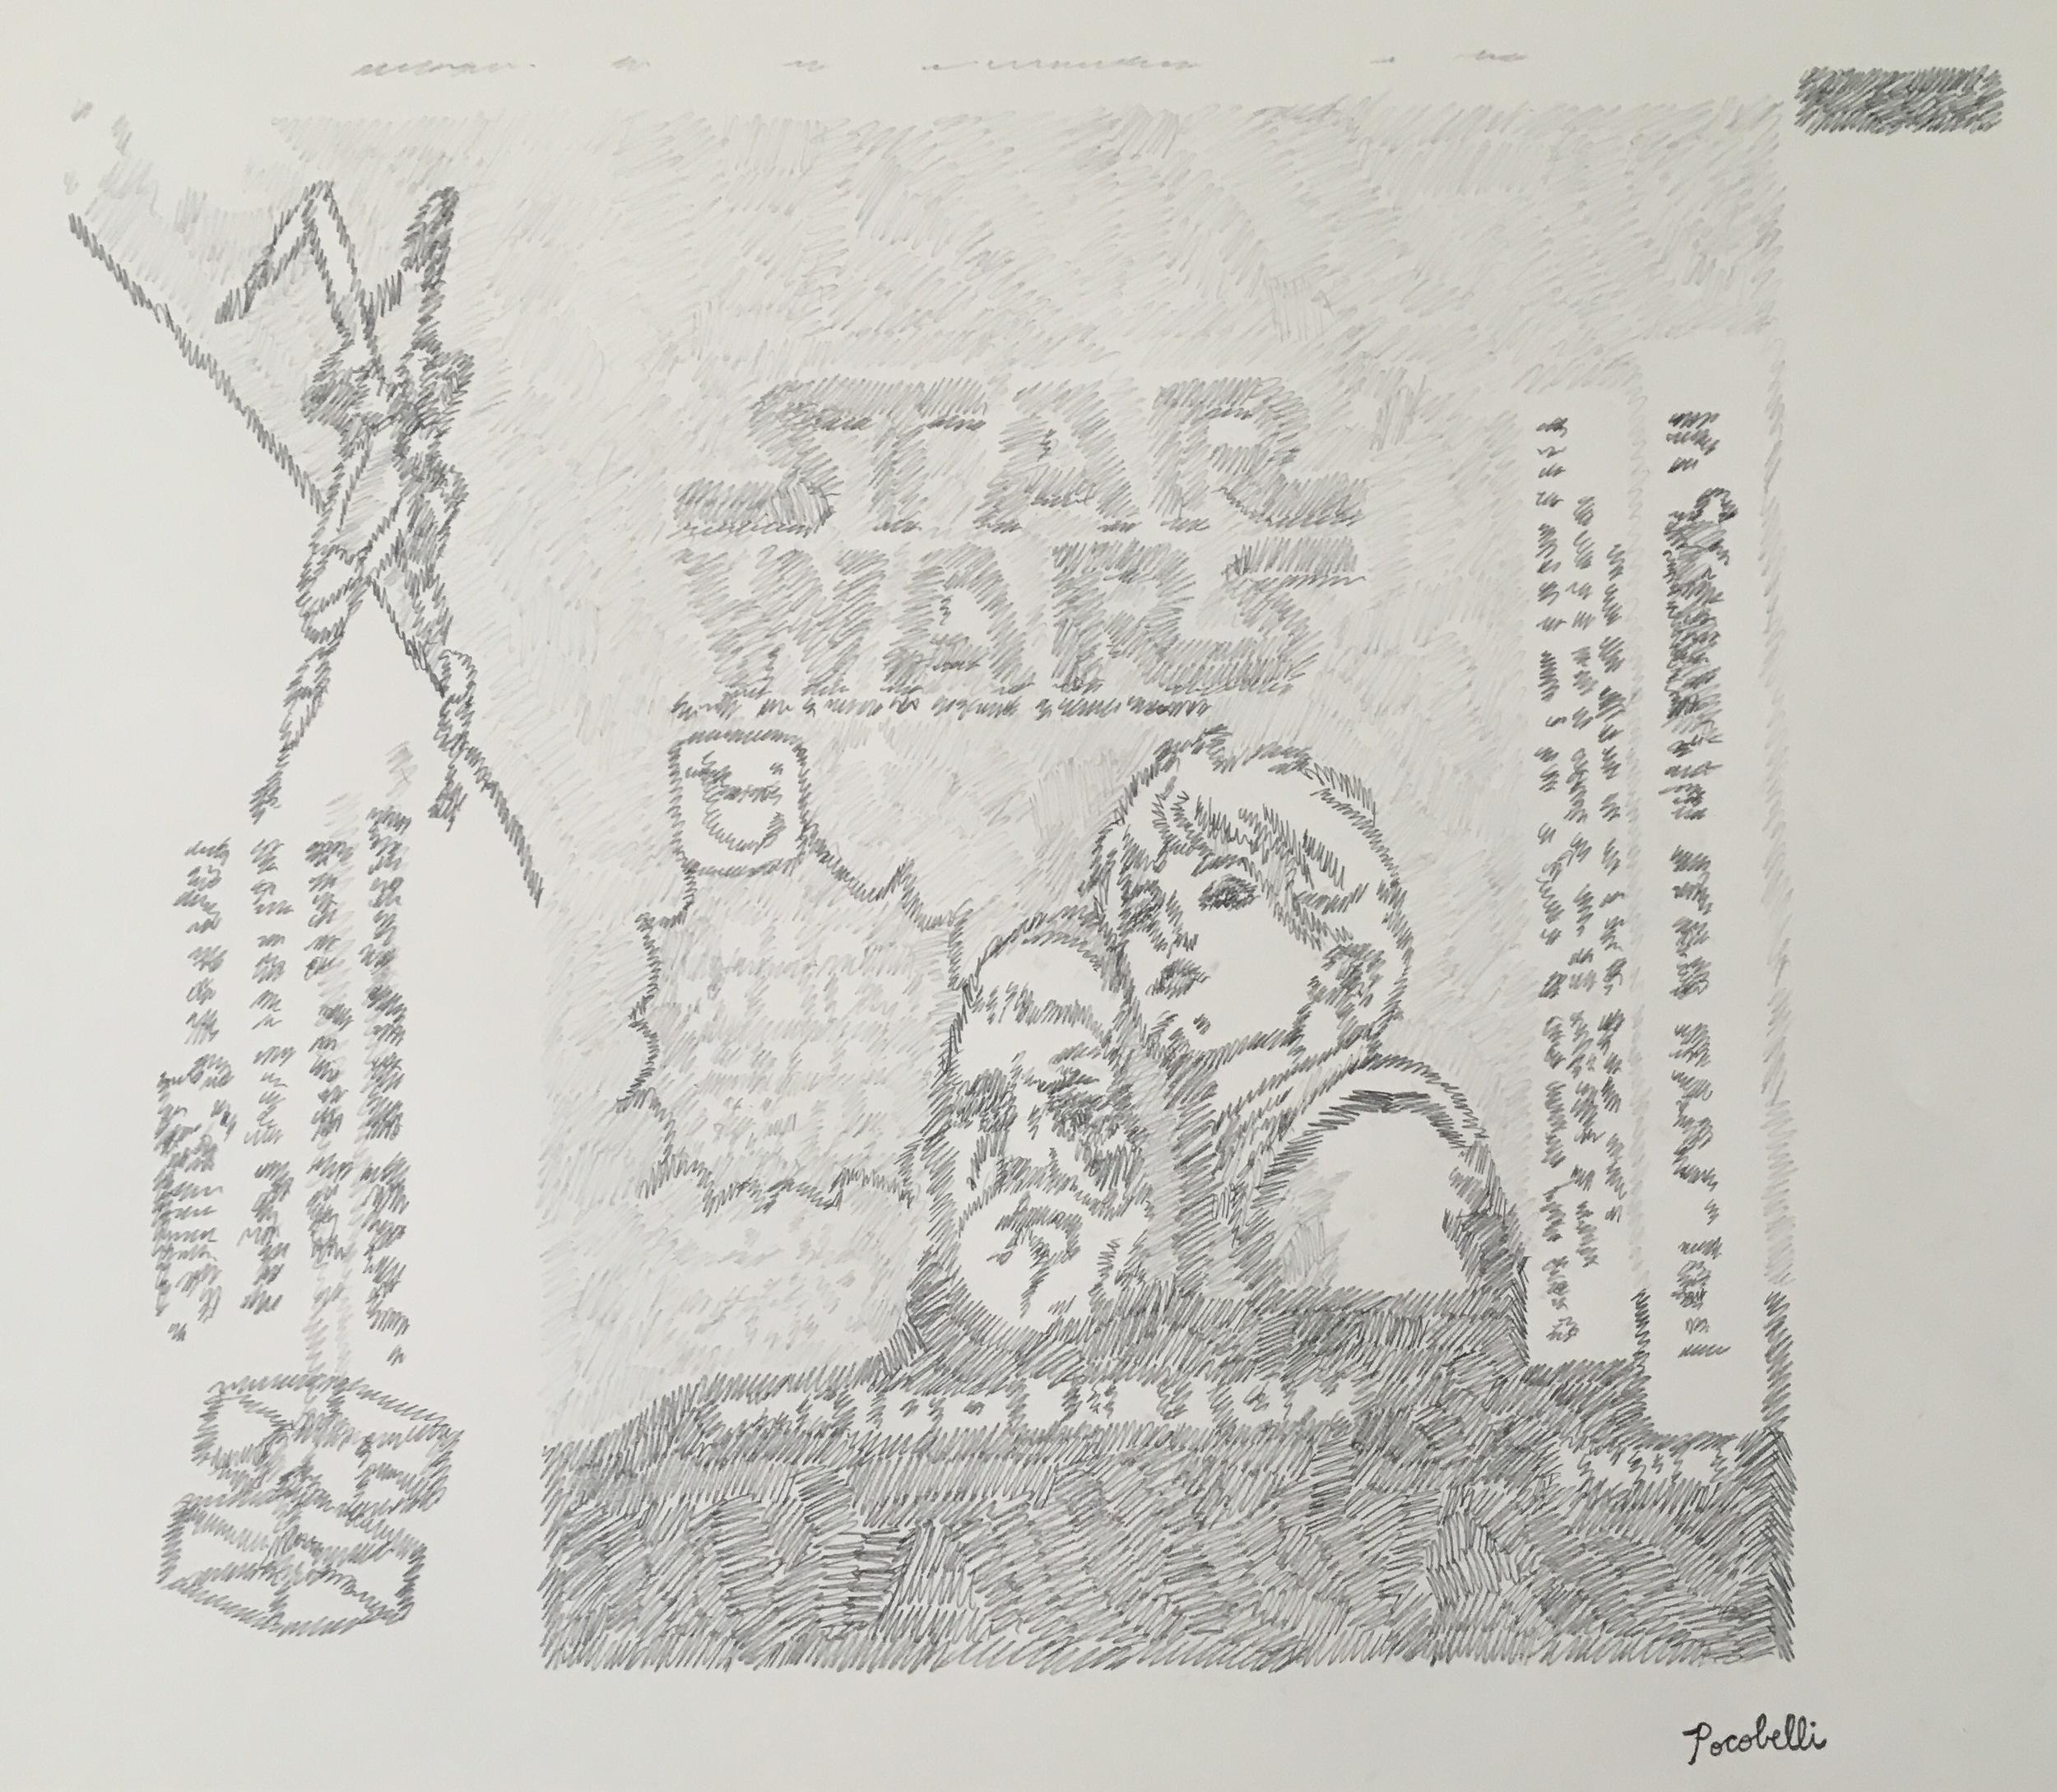 Topps Star Wars Wrapper I